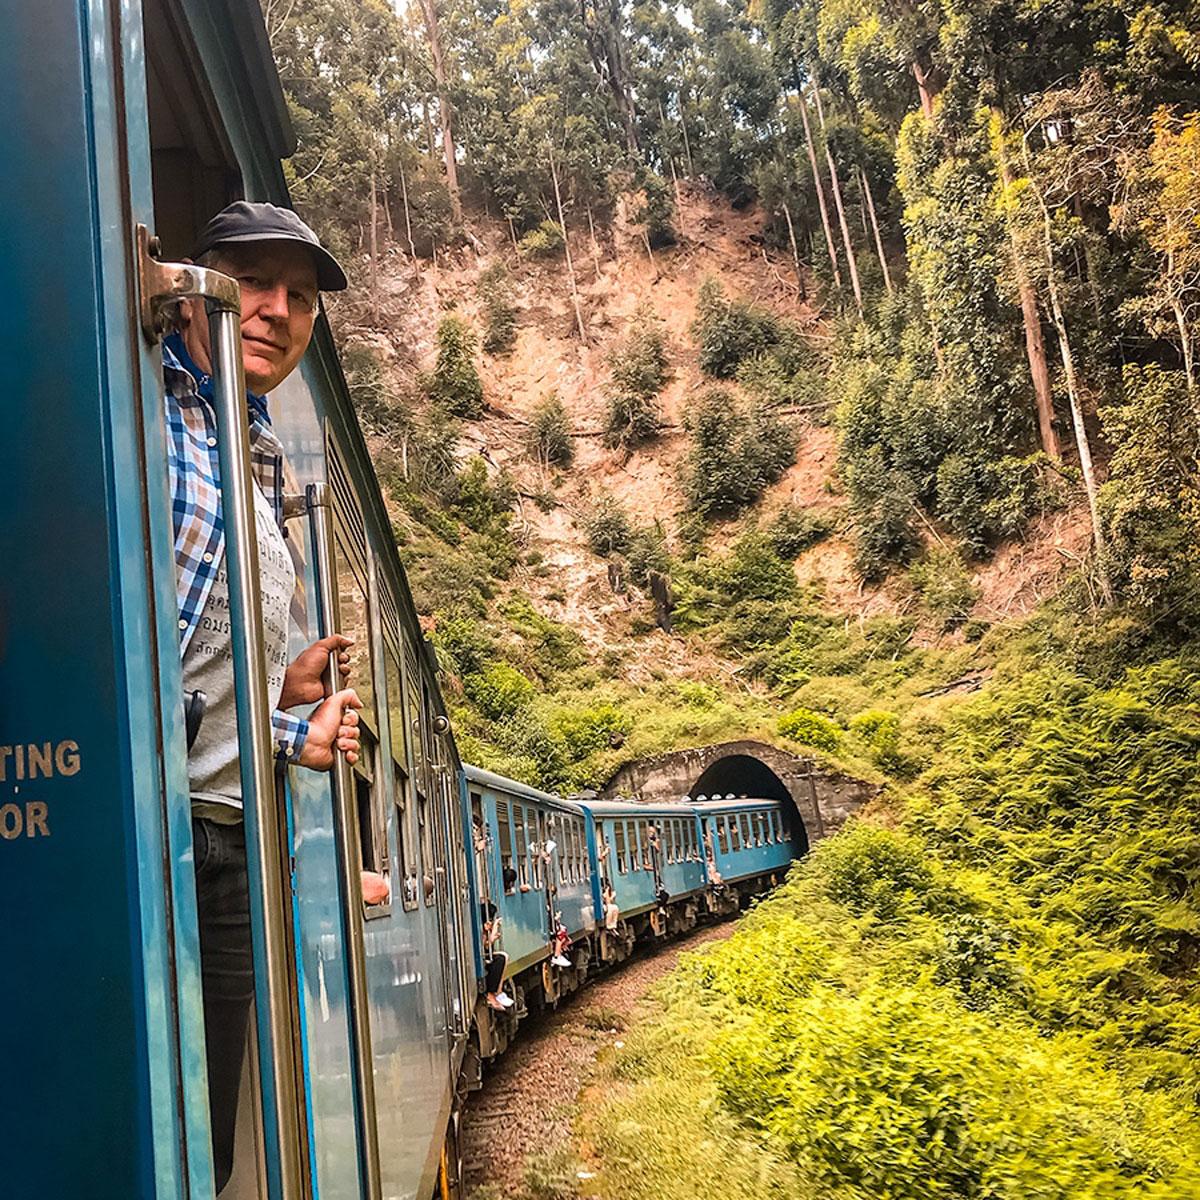 Ed on a train entering a tunnel - Sri Lanka